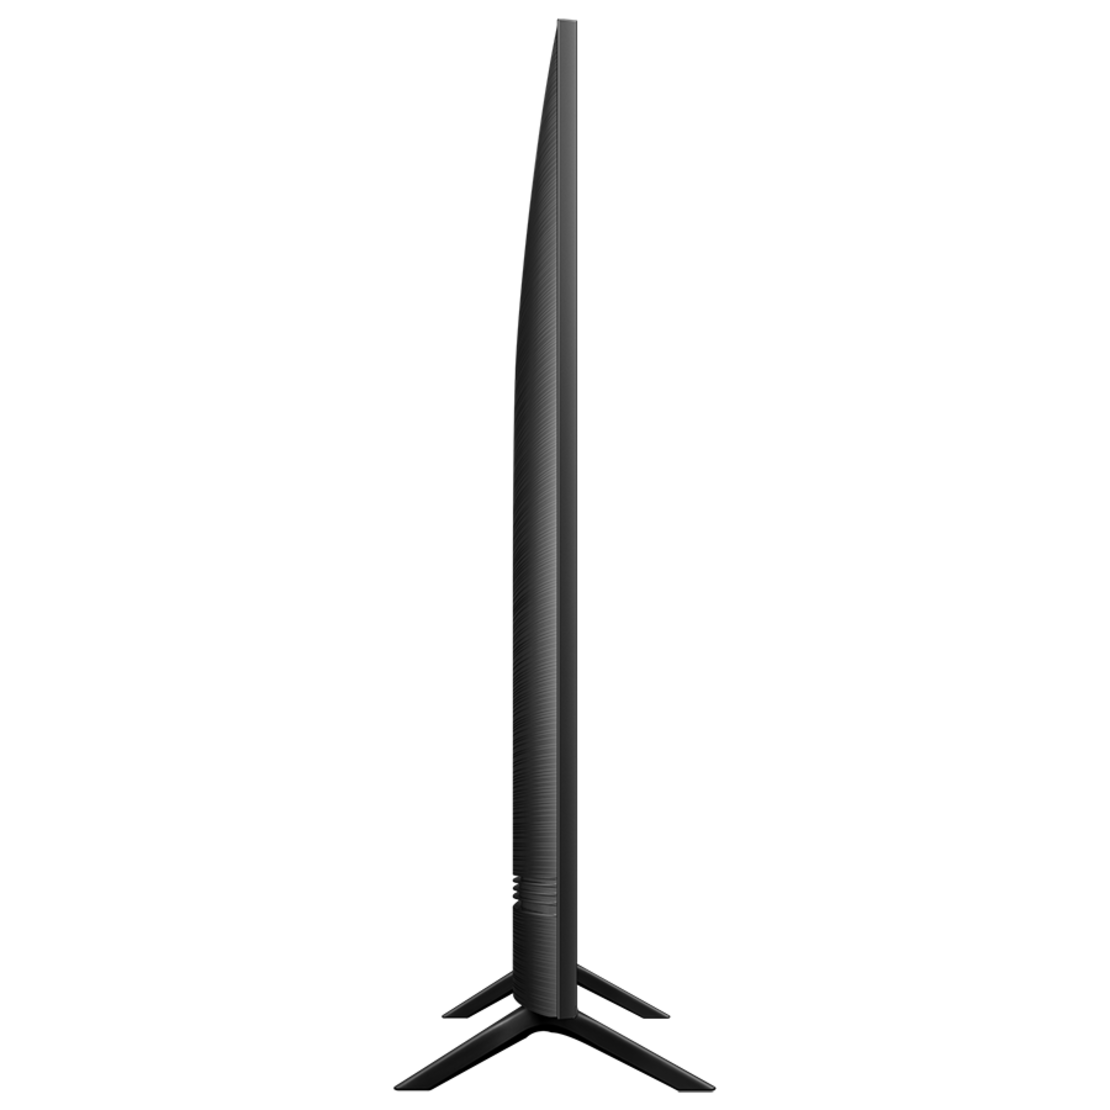 טלוויזיה Samsung 55 4K דגם QE55Q60T